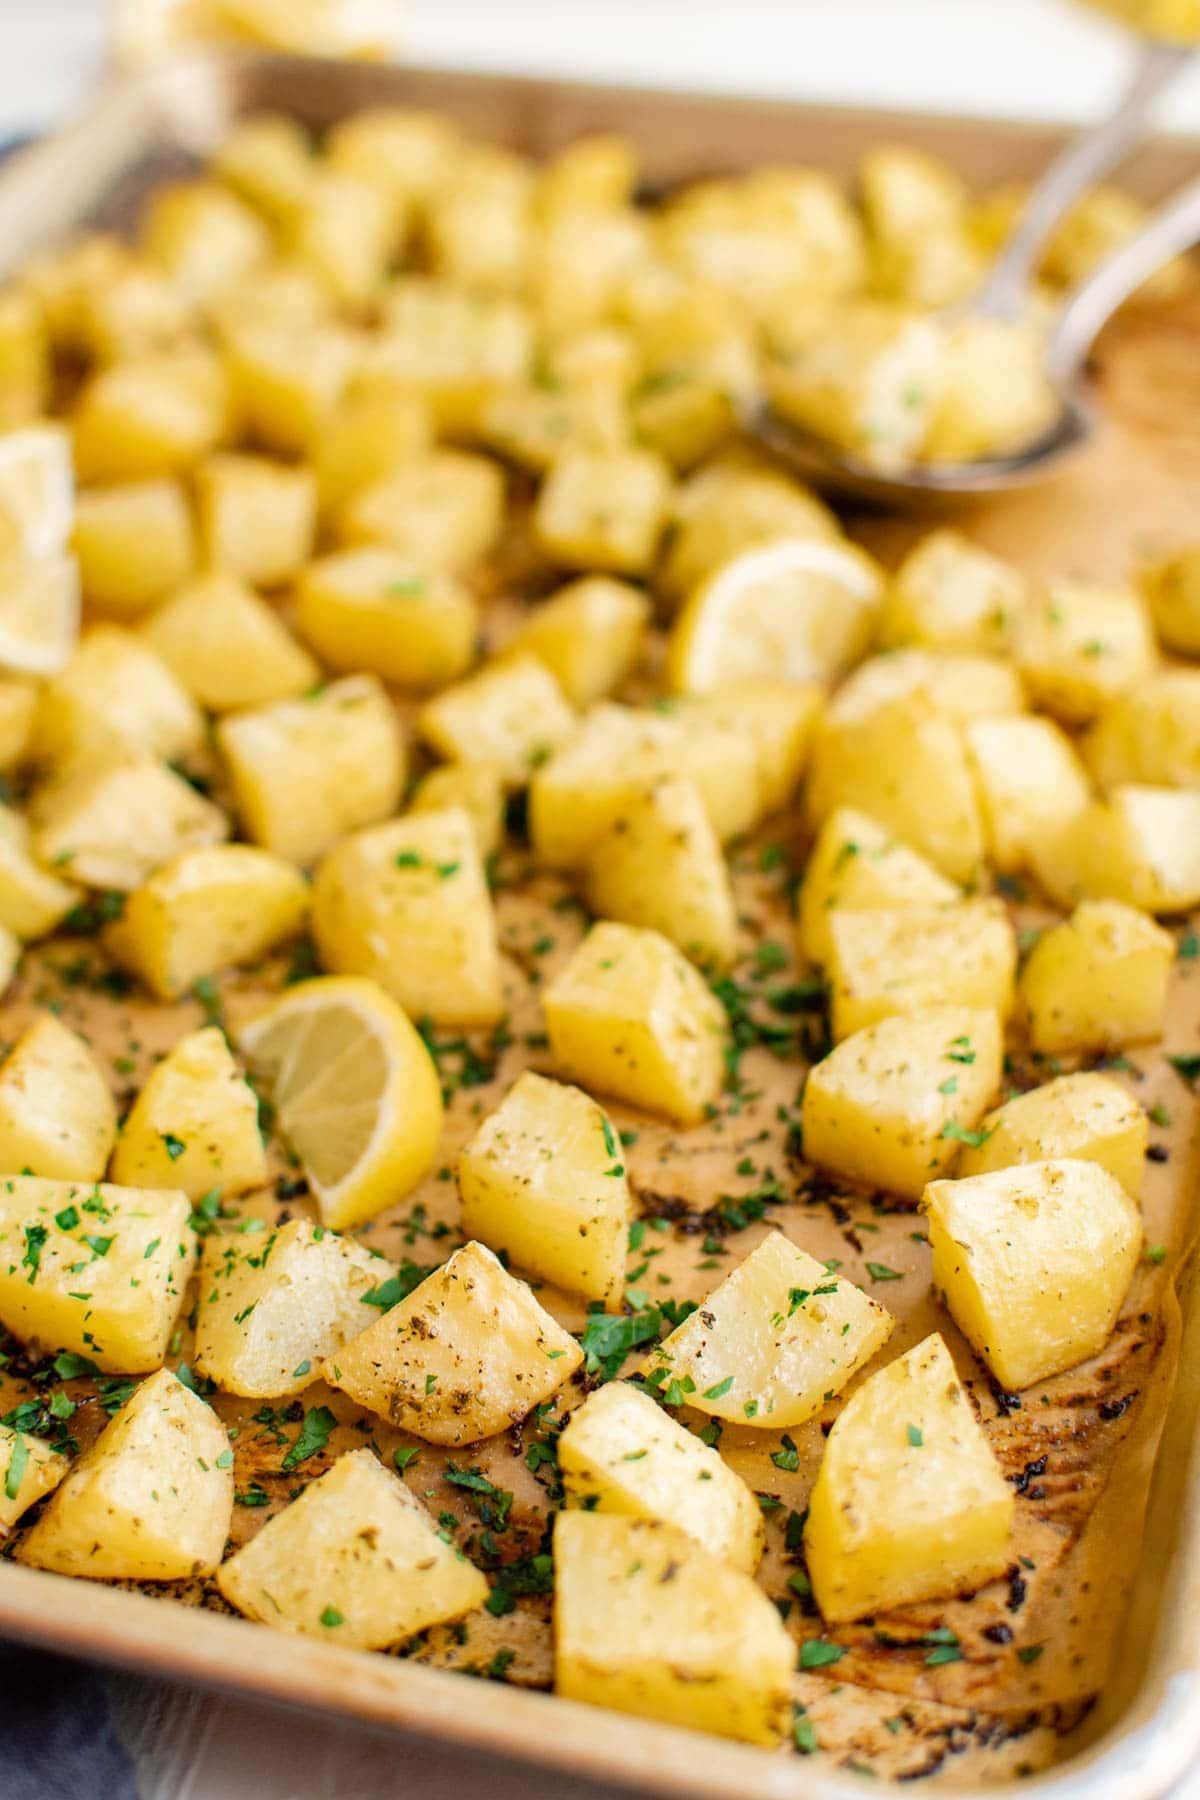 baking sheet, potatoes, parsley